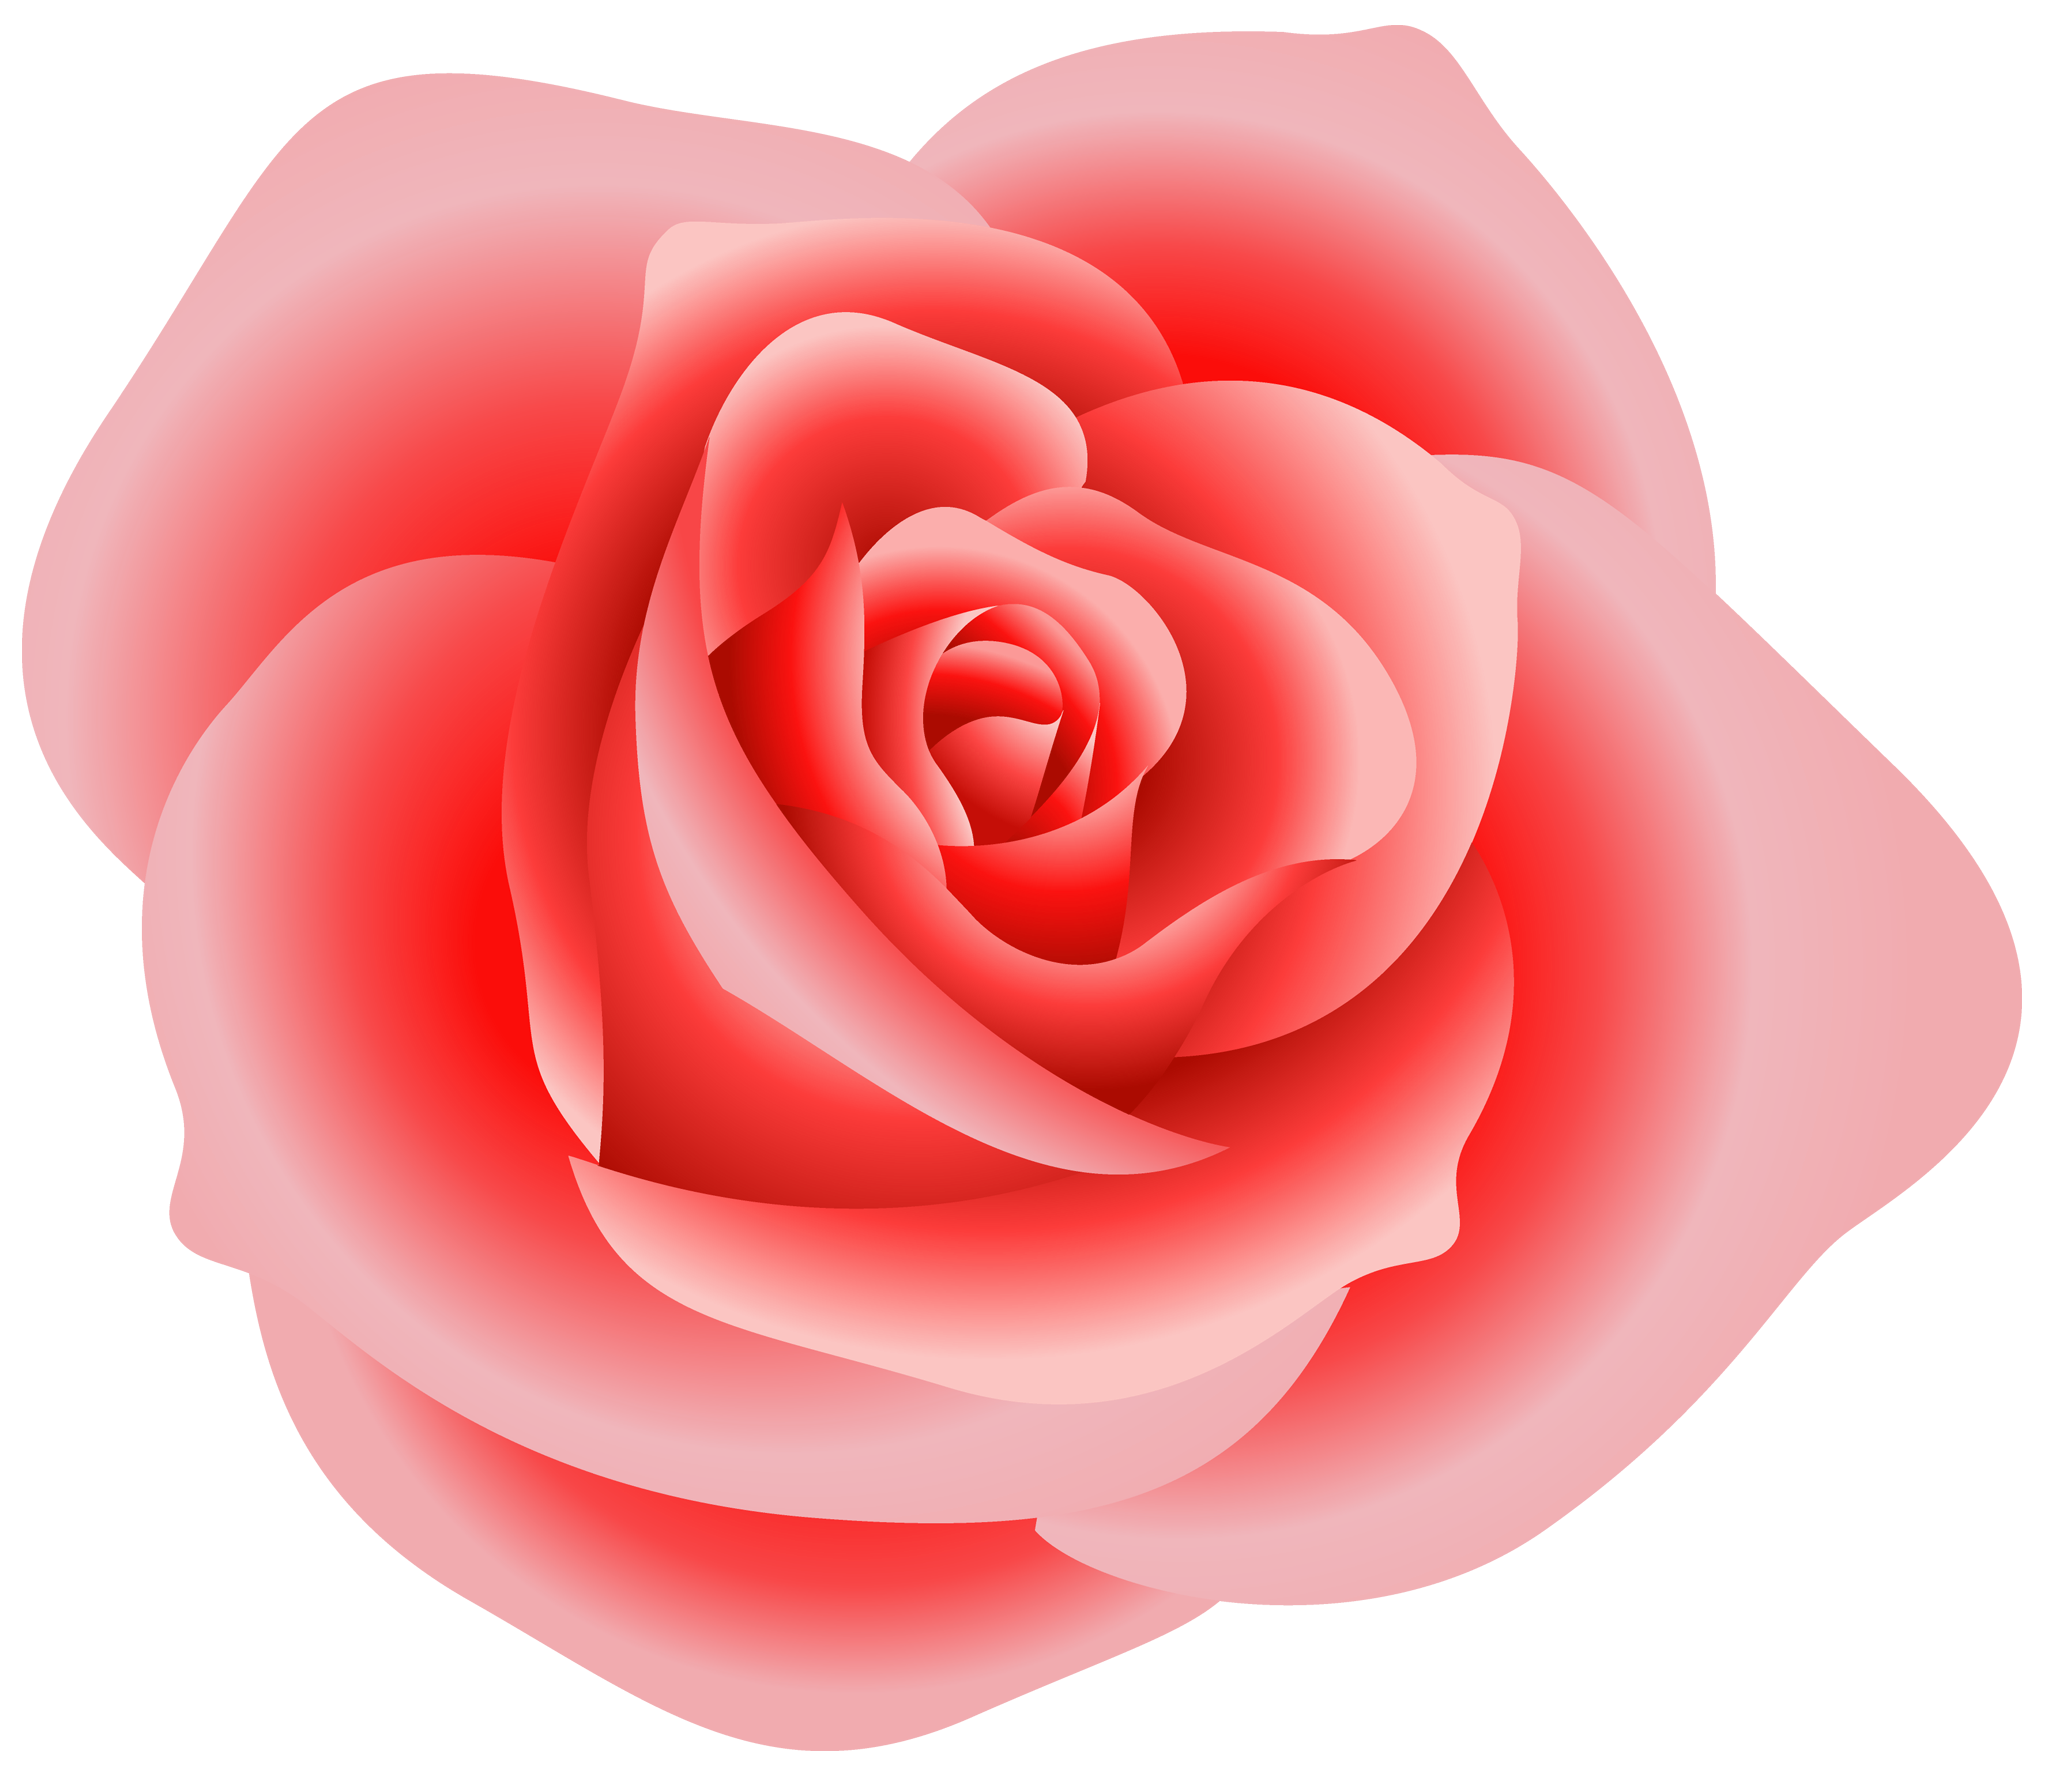 Roses rose clip art vector im - Clipart Roses